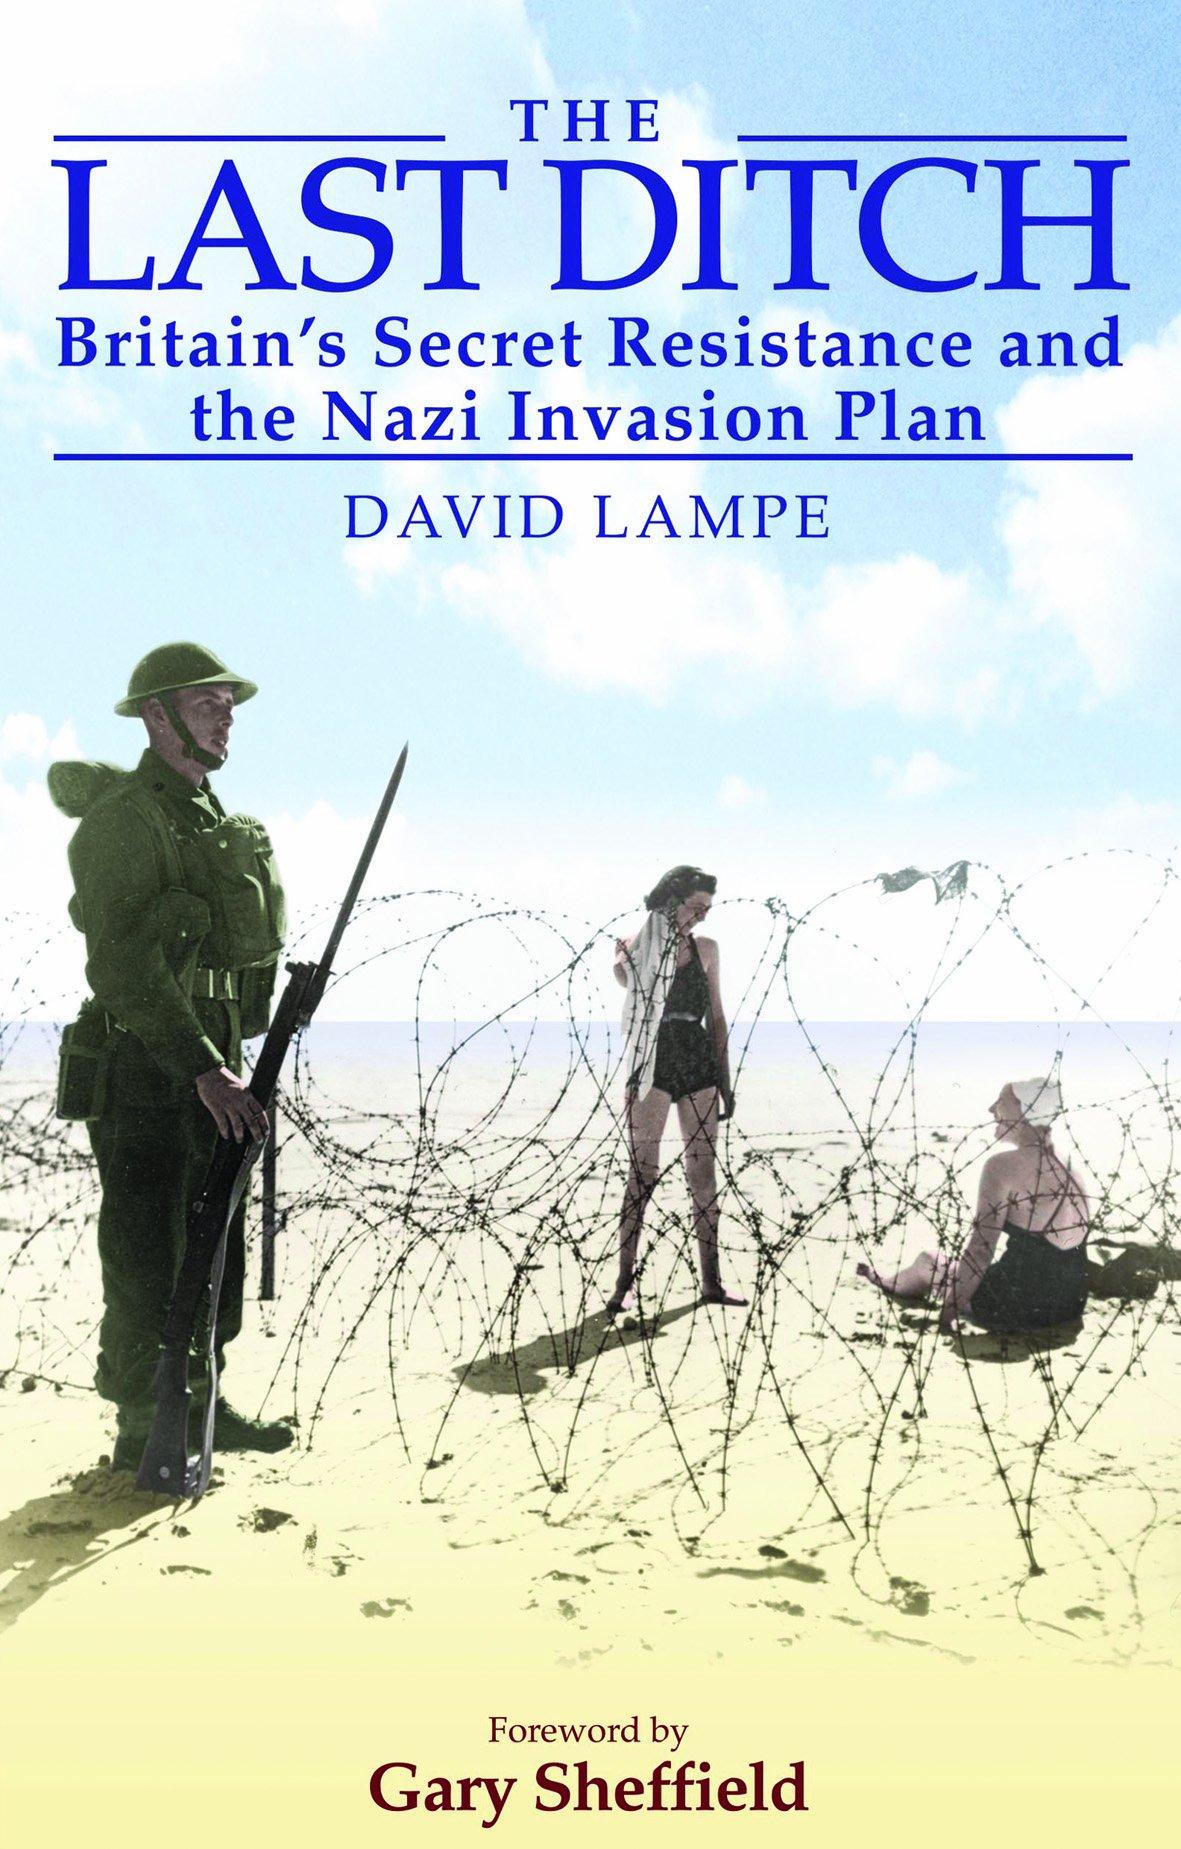 The Last Ditch: Britain's Secret Resistance and the Nazi Invasion Plan PDF